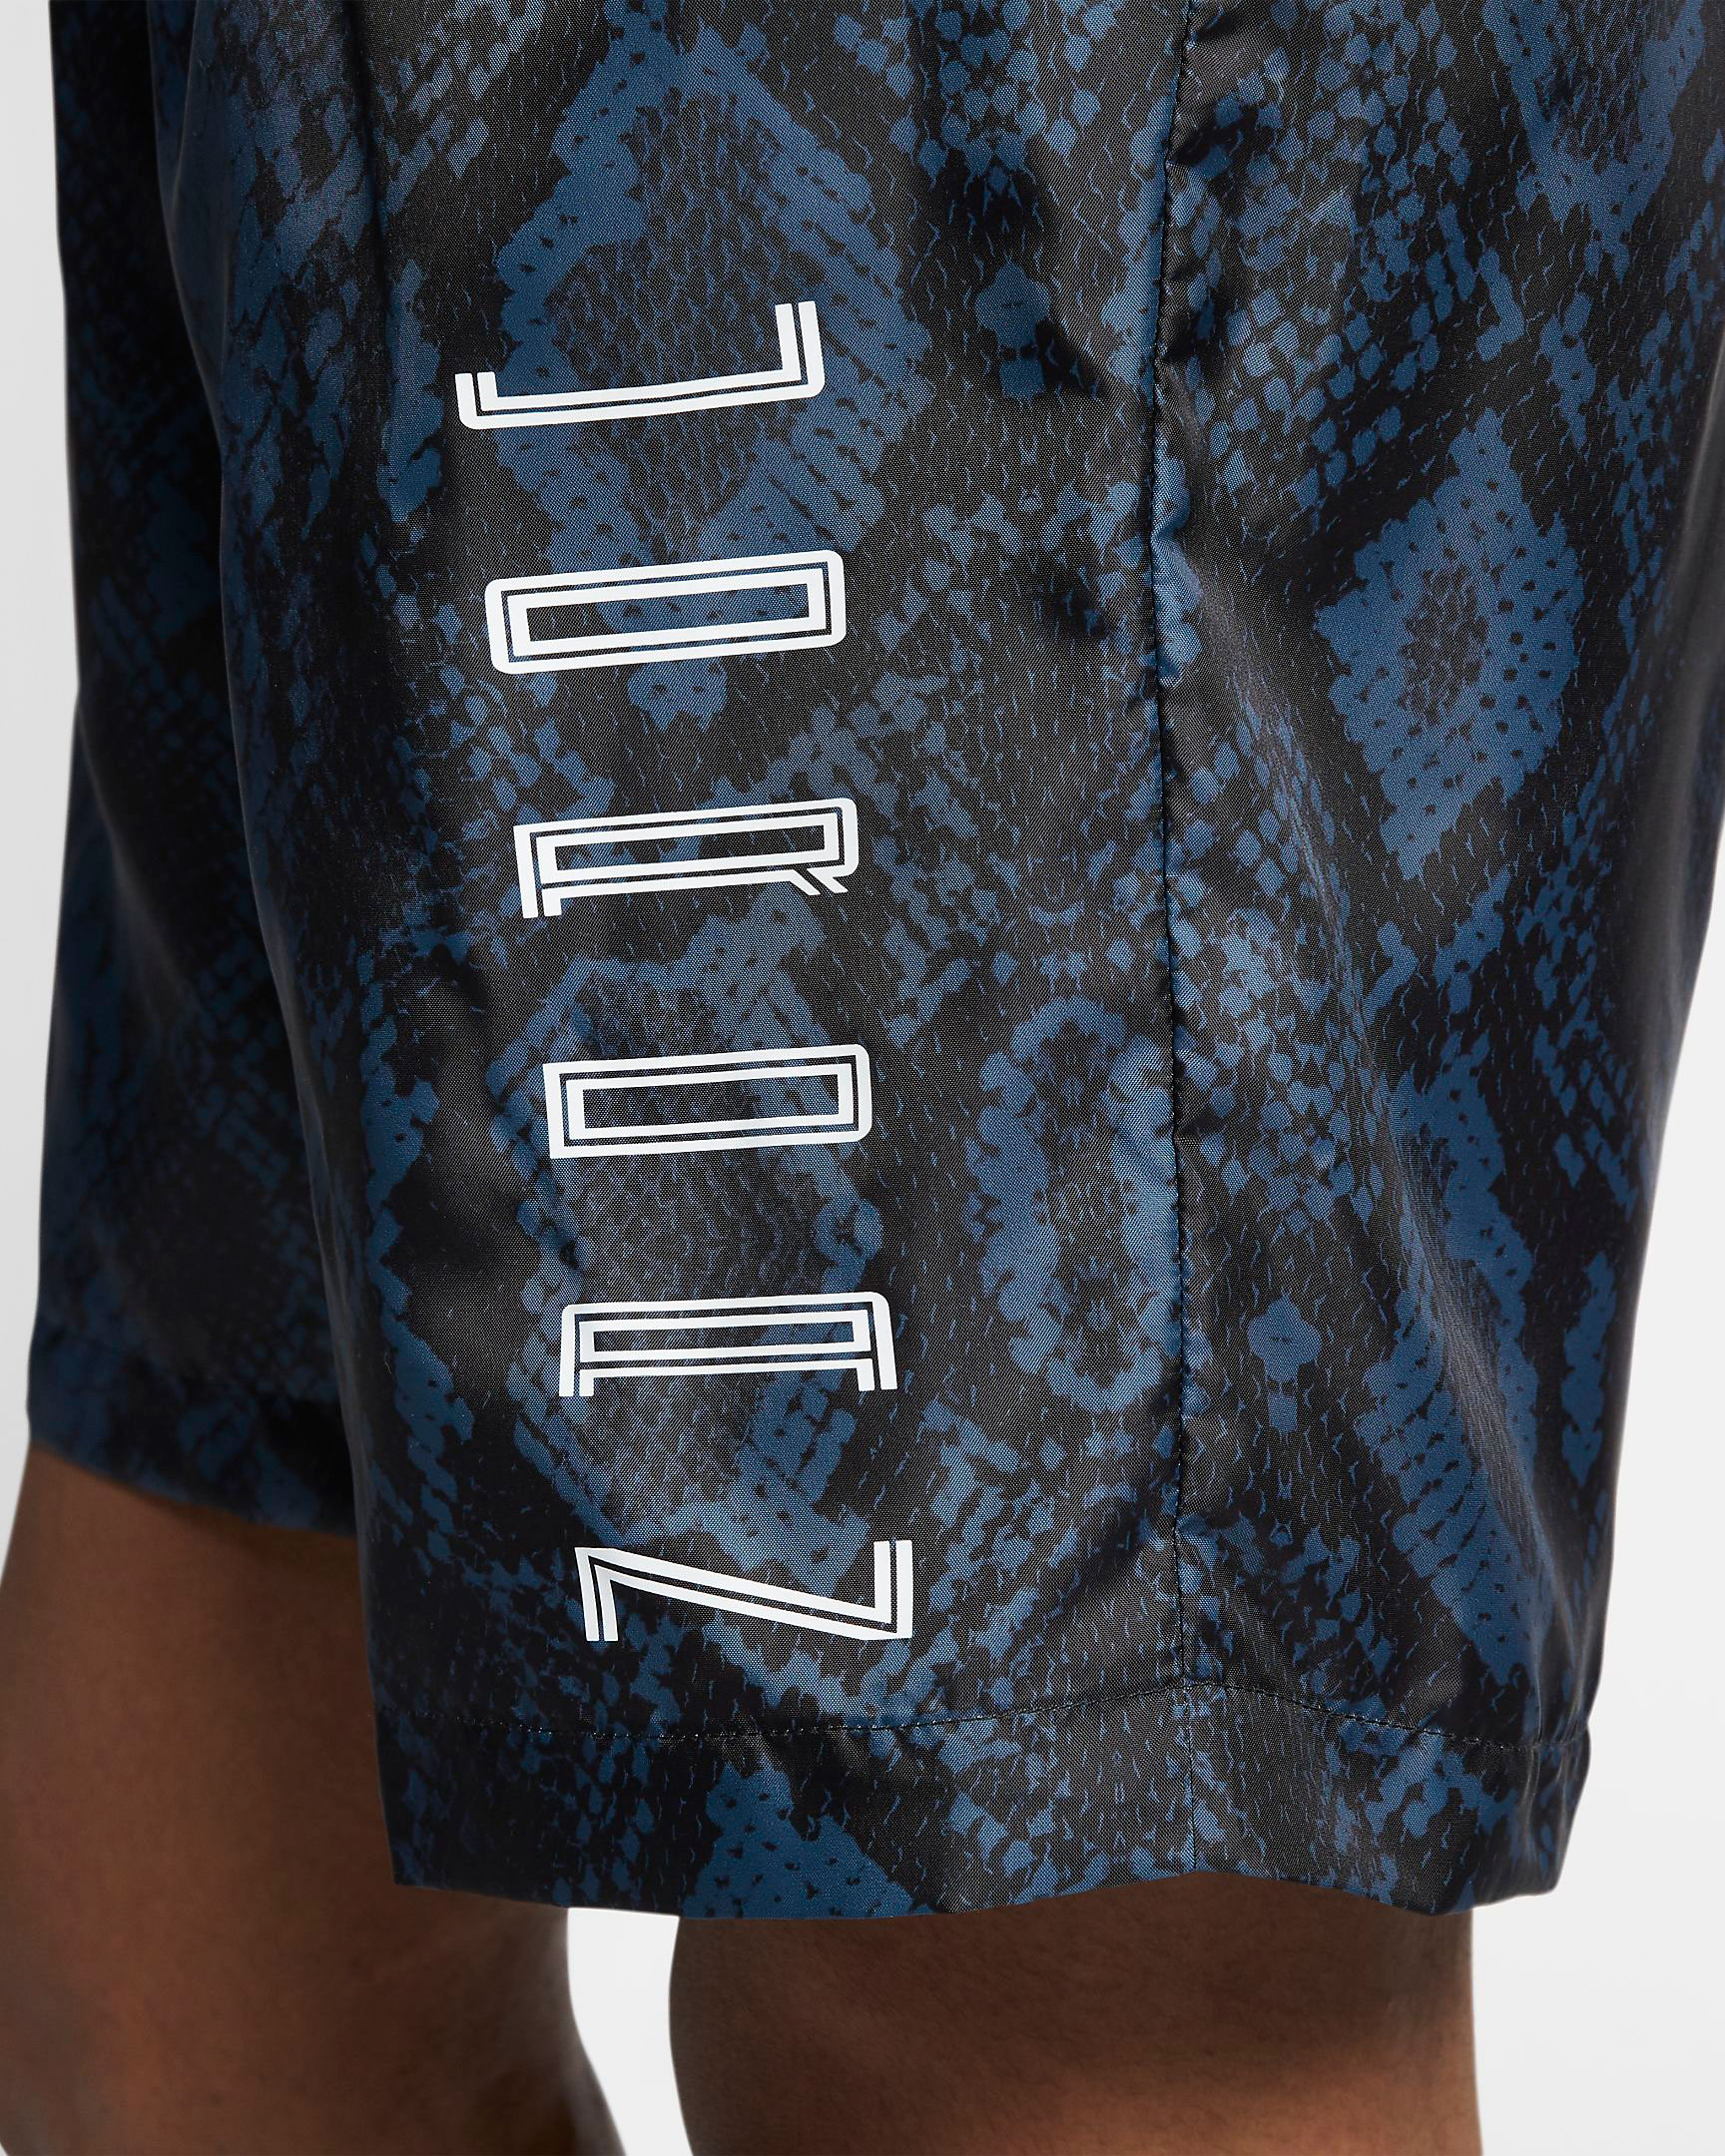 air-jordan-11-low-snakeskin-navy-blue-shorts-3